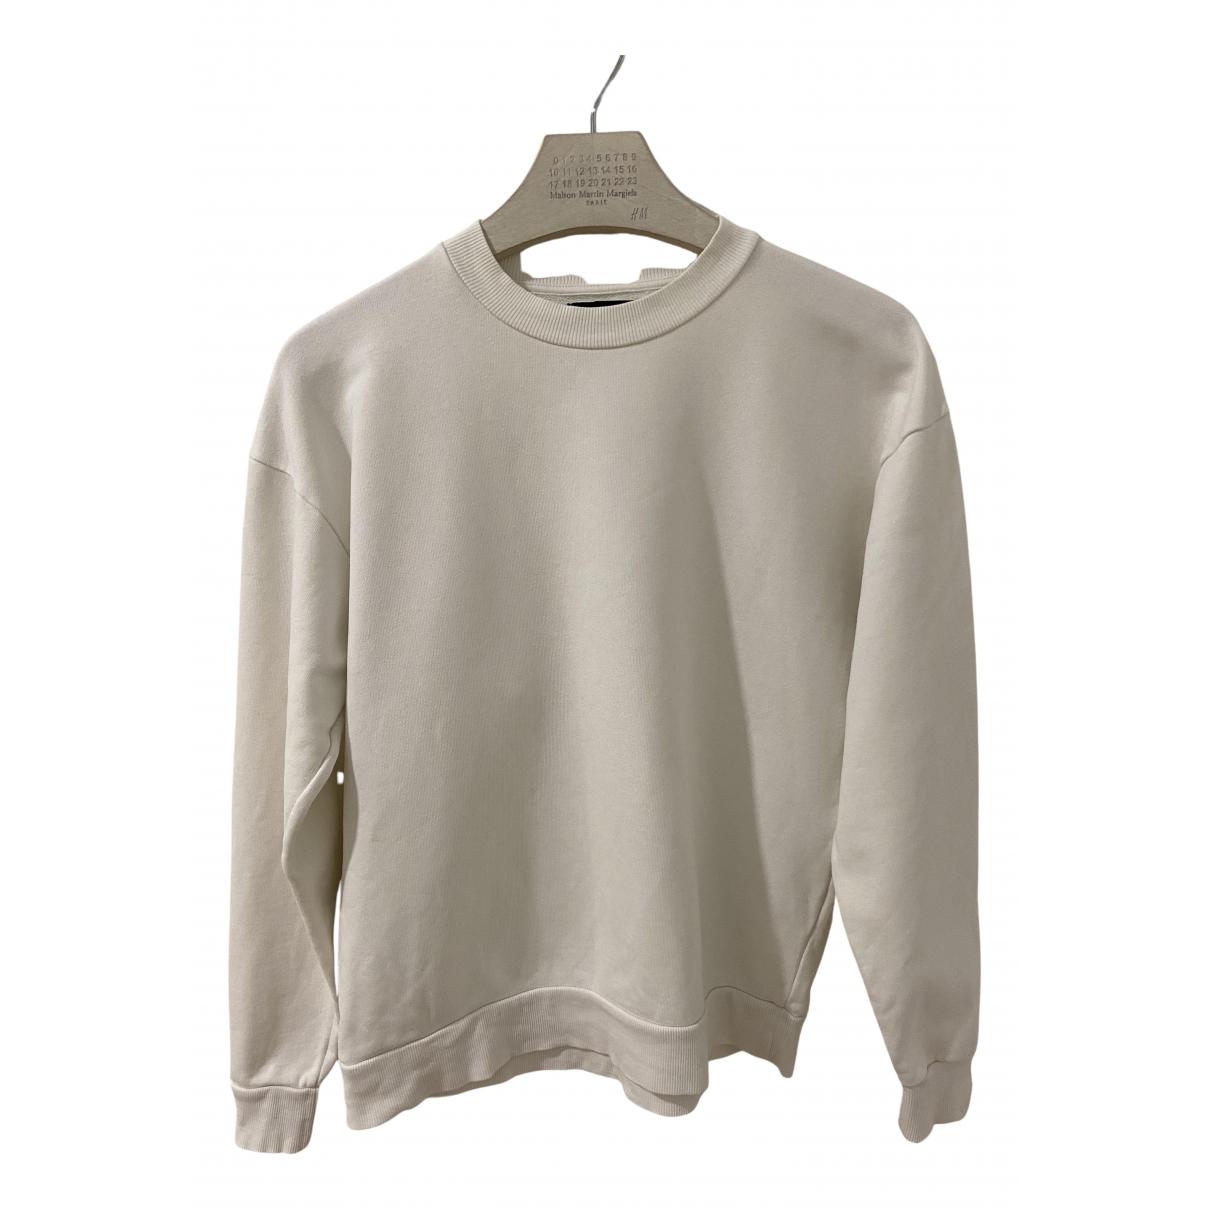 Zara - Pull   pour femme en coton - blanc